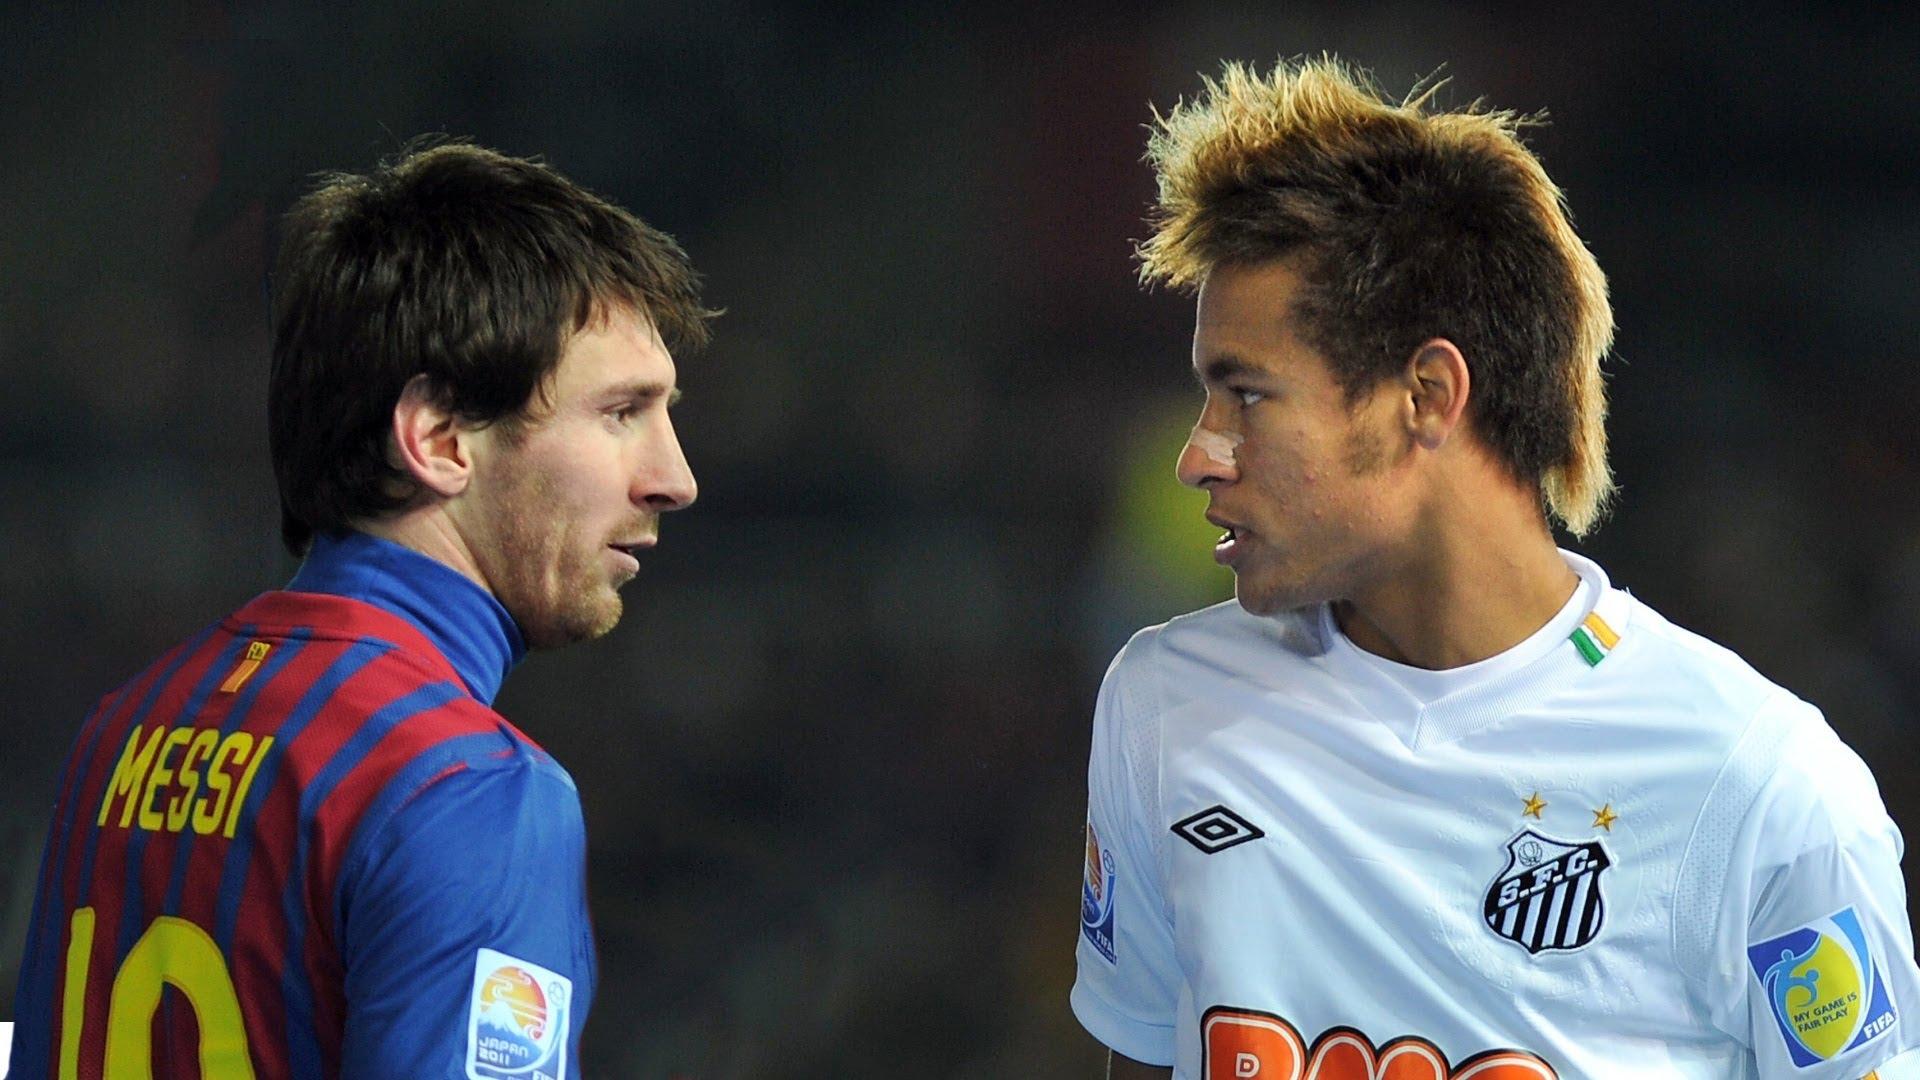 Messi Vs Neymar Wallpaper   Football HD Wallpapers 1920x1080